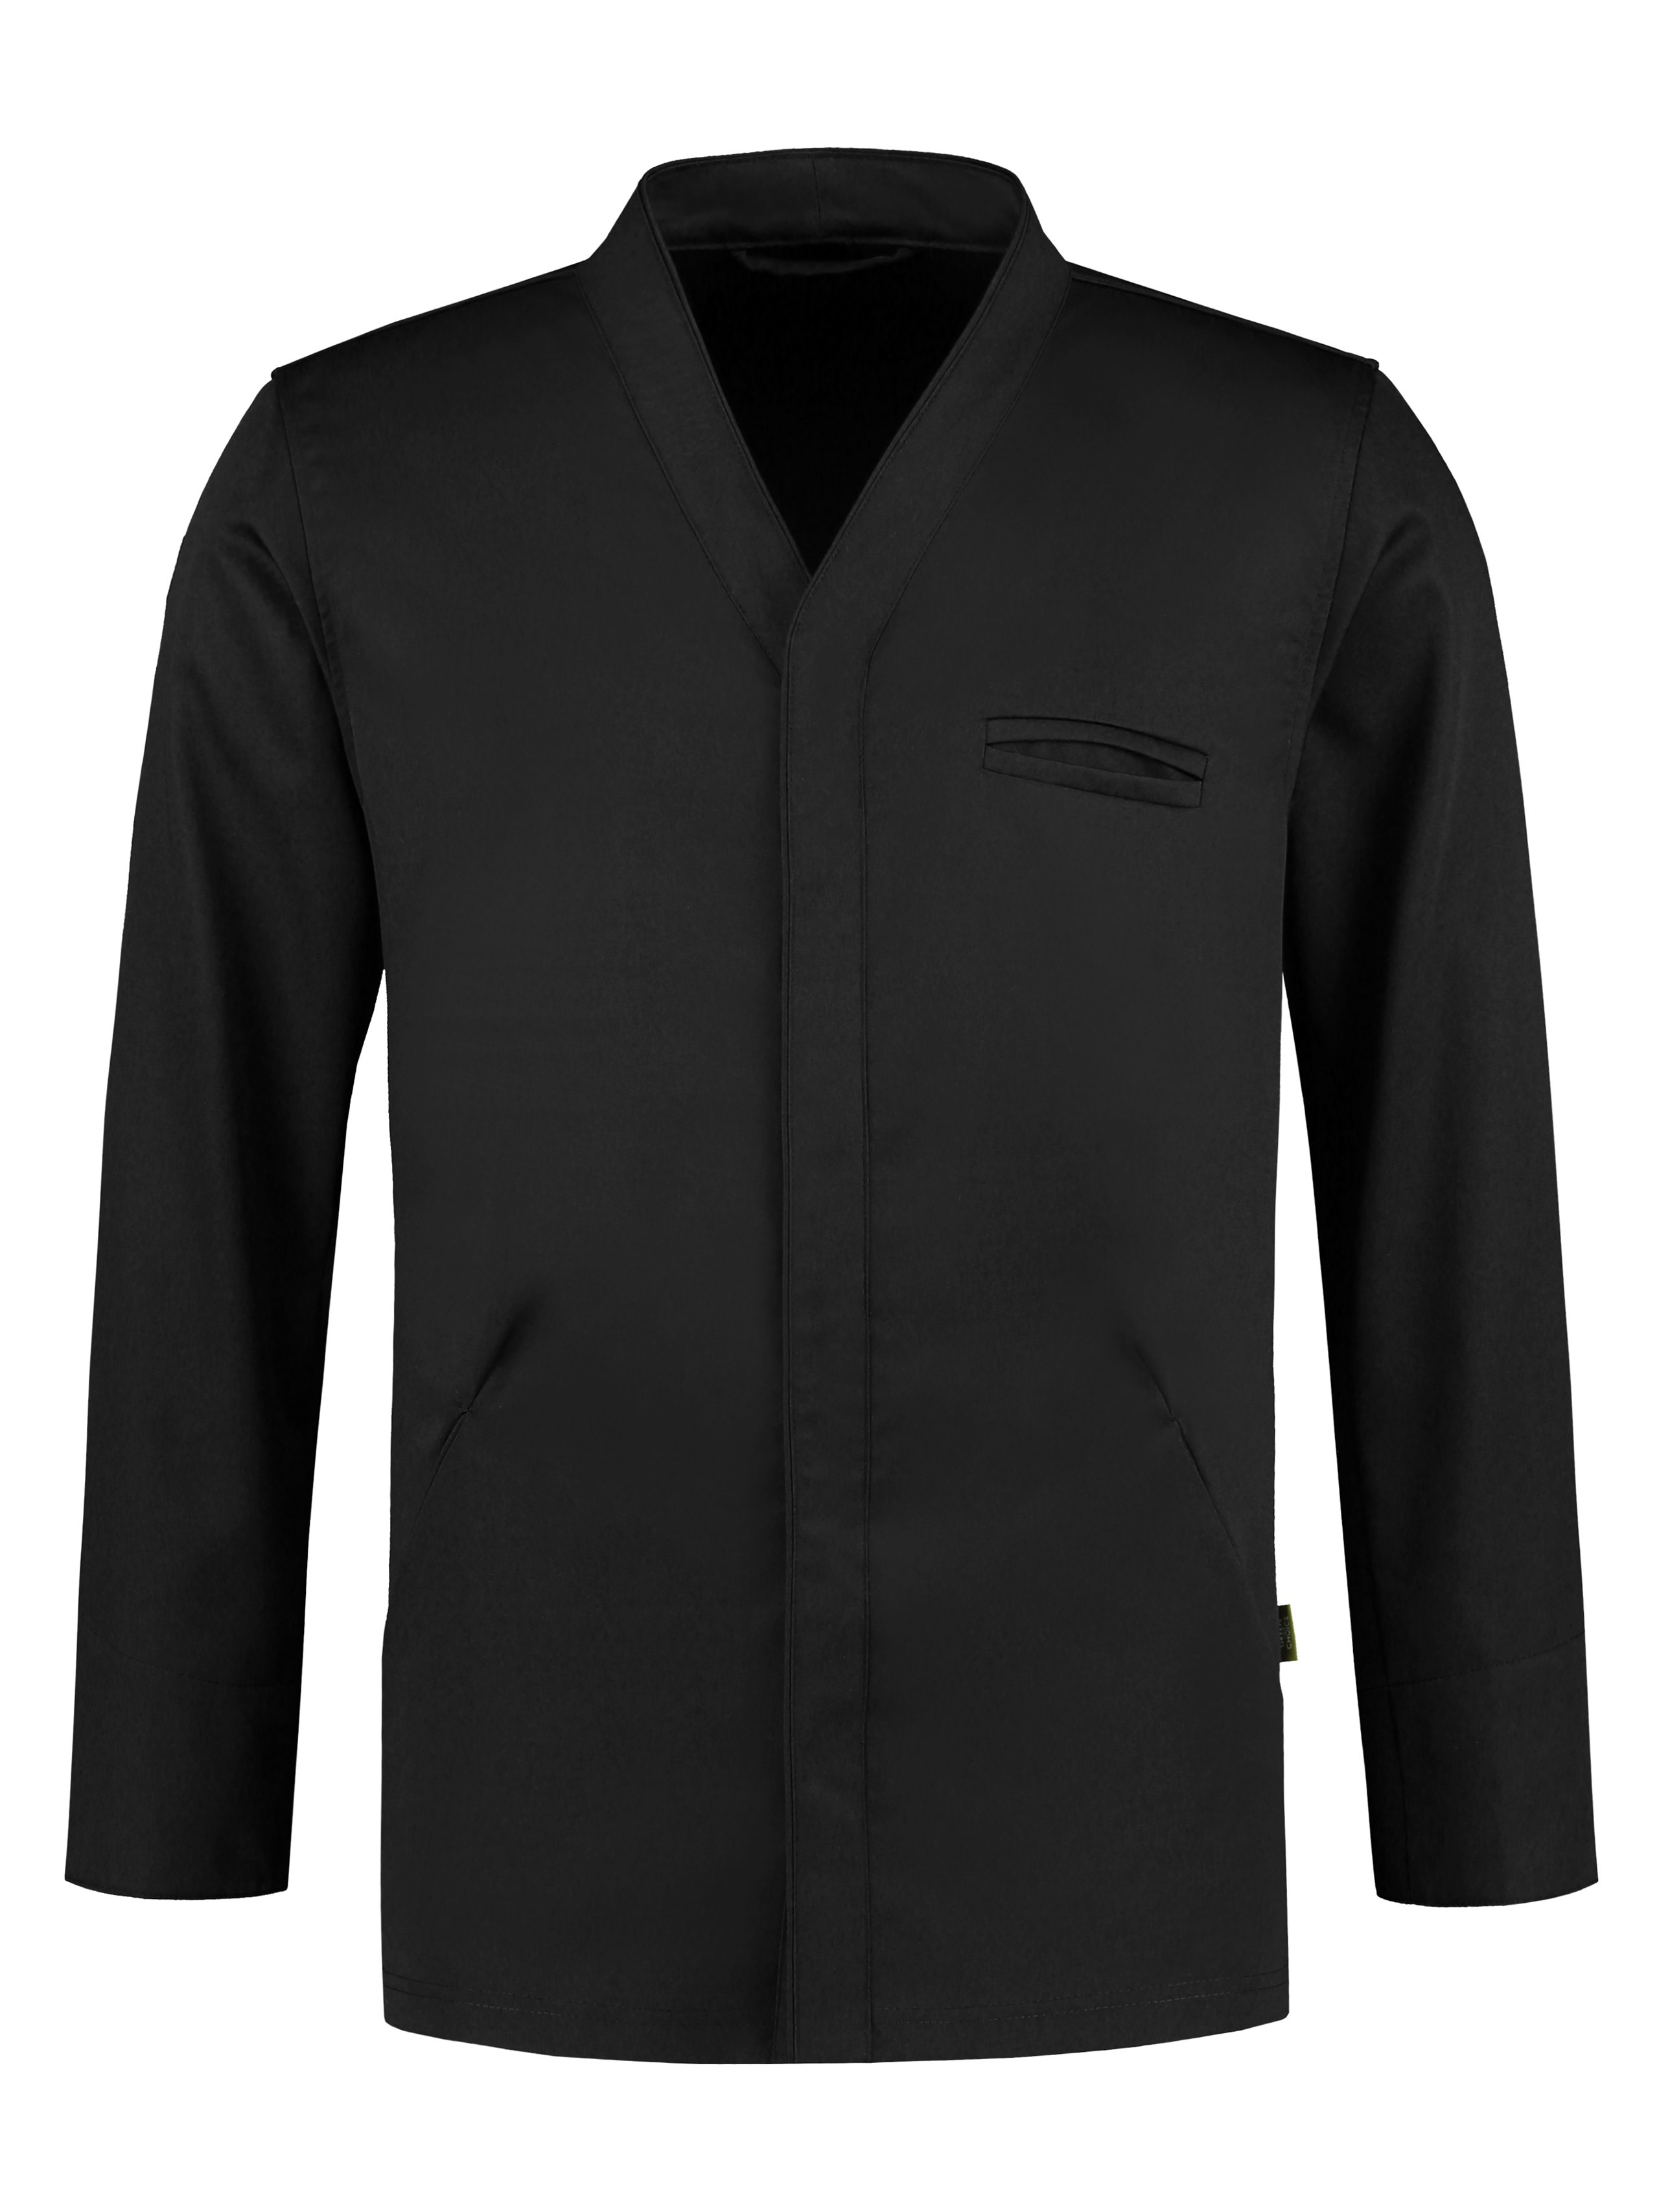 Chef Jacket Andreas Black